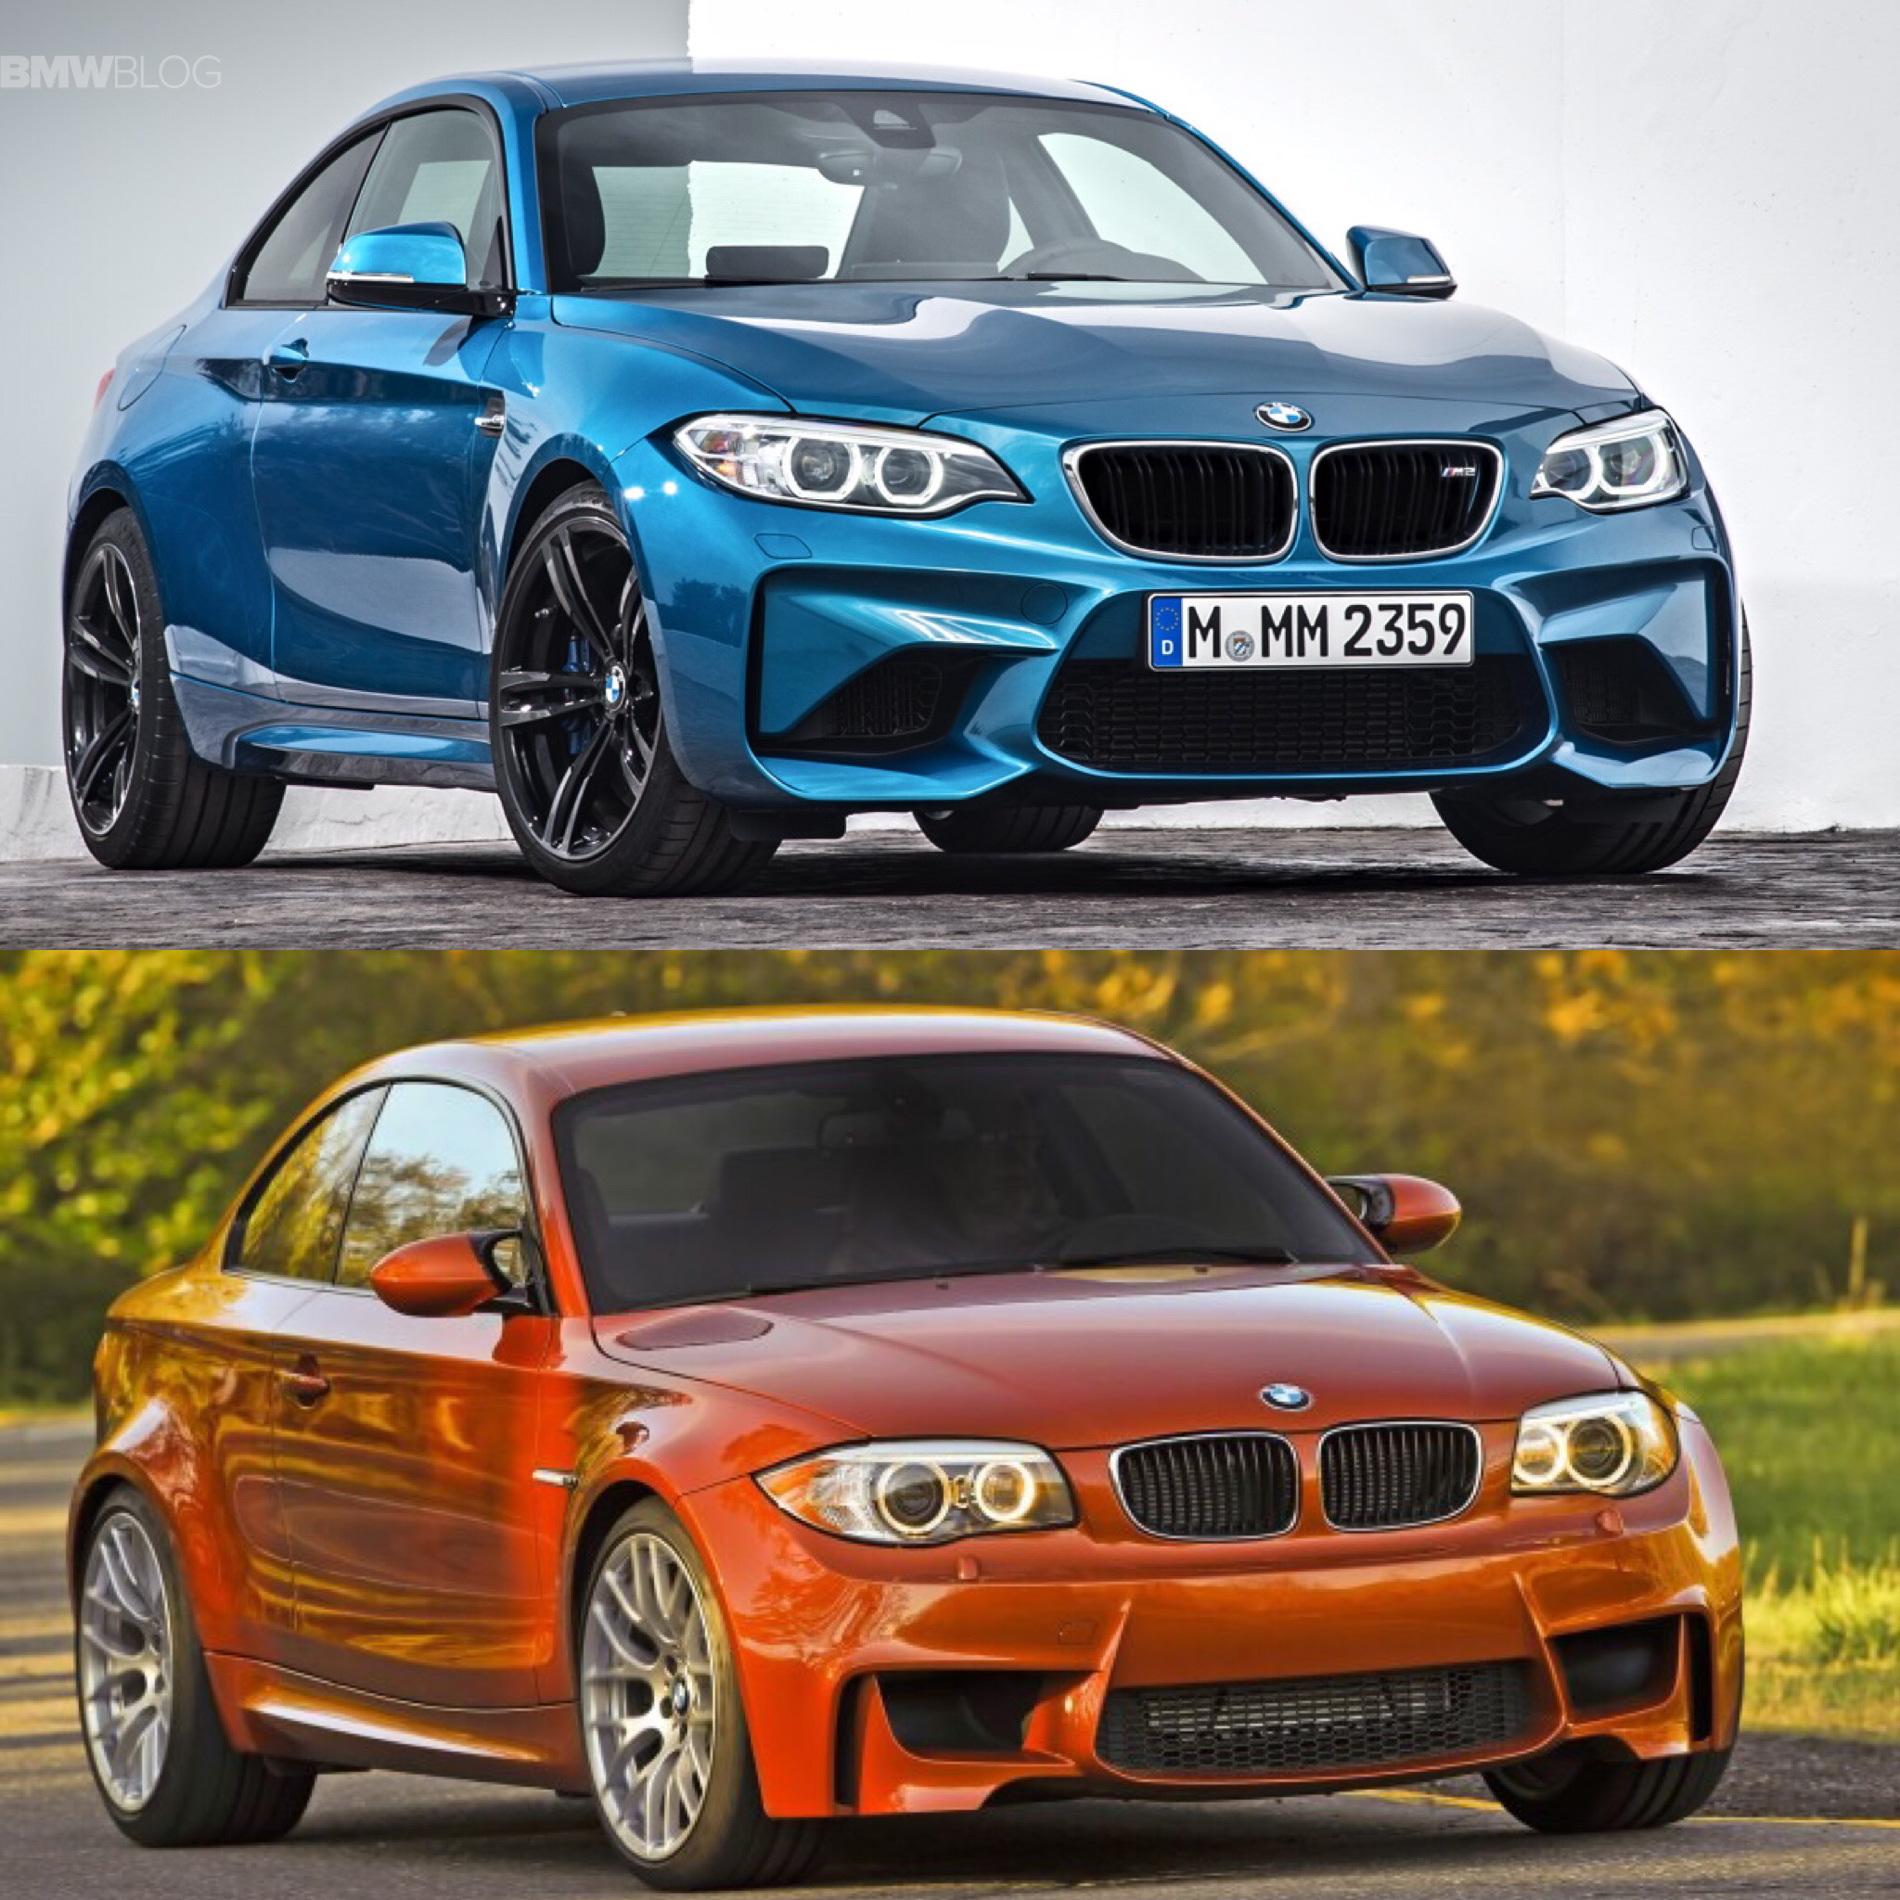 BMW M2 vs BMW 1M comparison 02